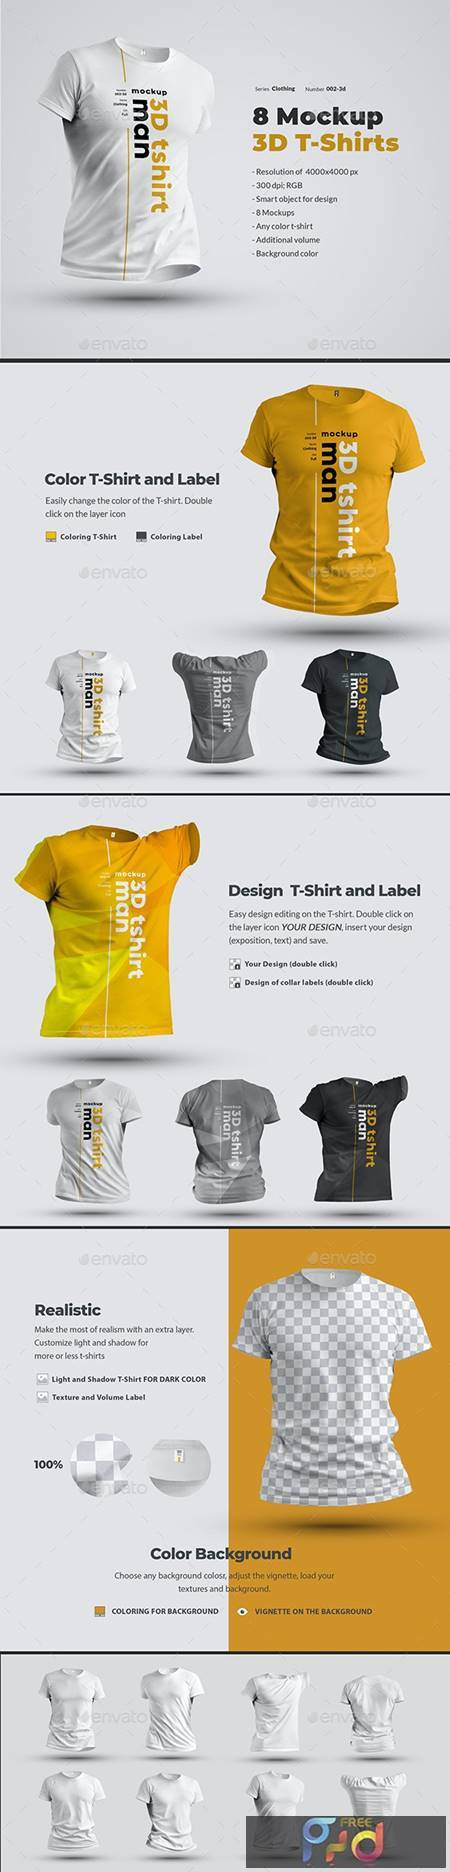 8 Mockups T-Shirts 3d Man 24638907 1